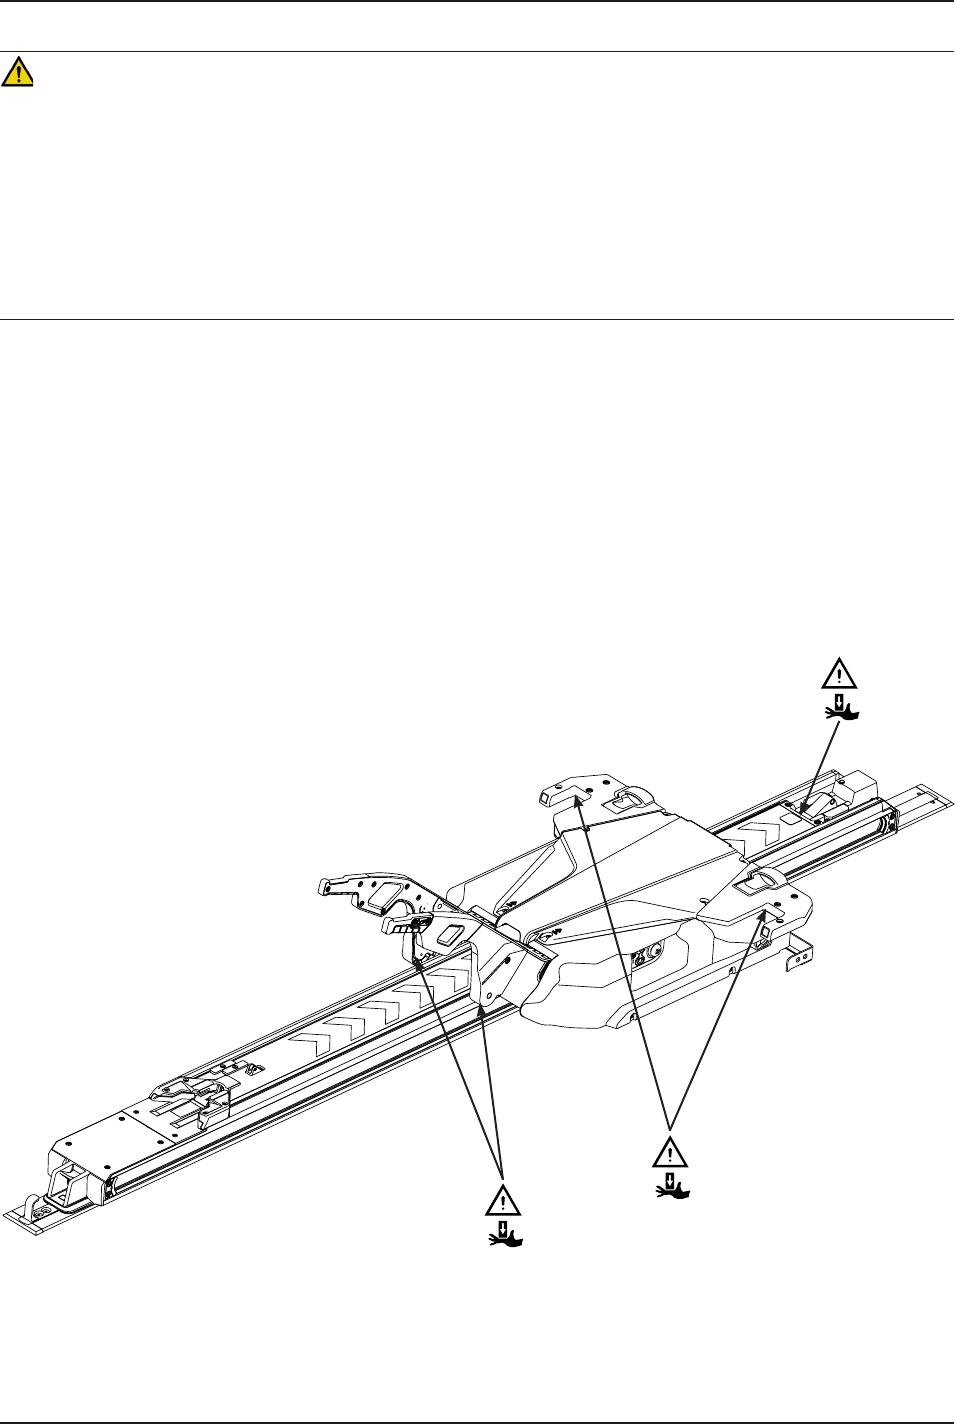 Stryker Medical 6390 Power-LOAD User Manual 10f4